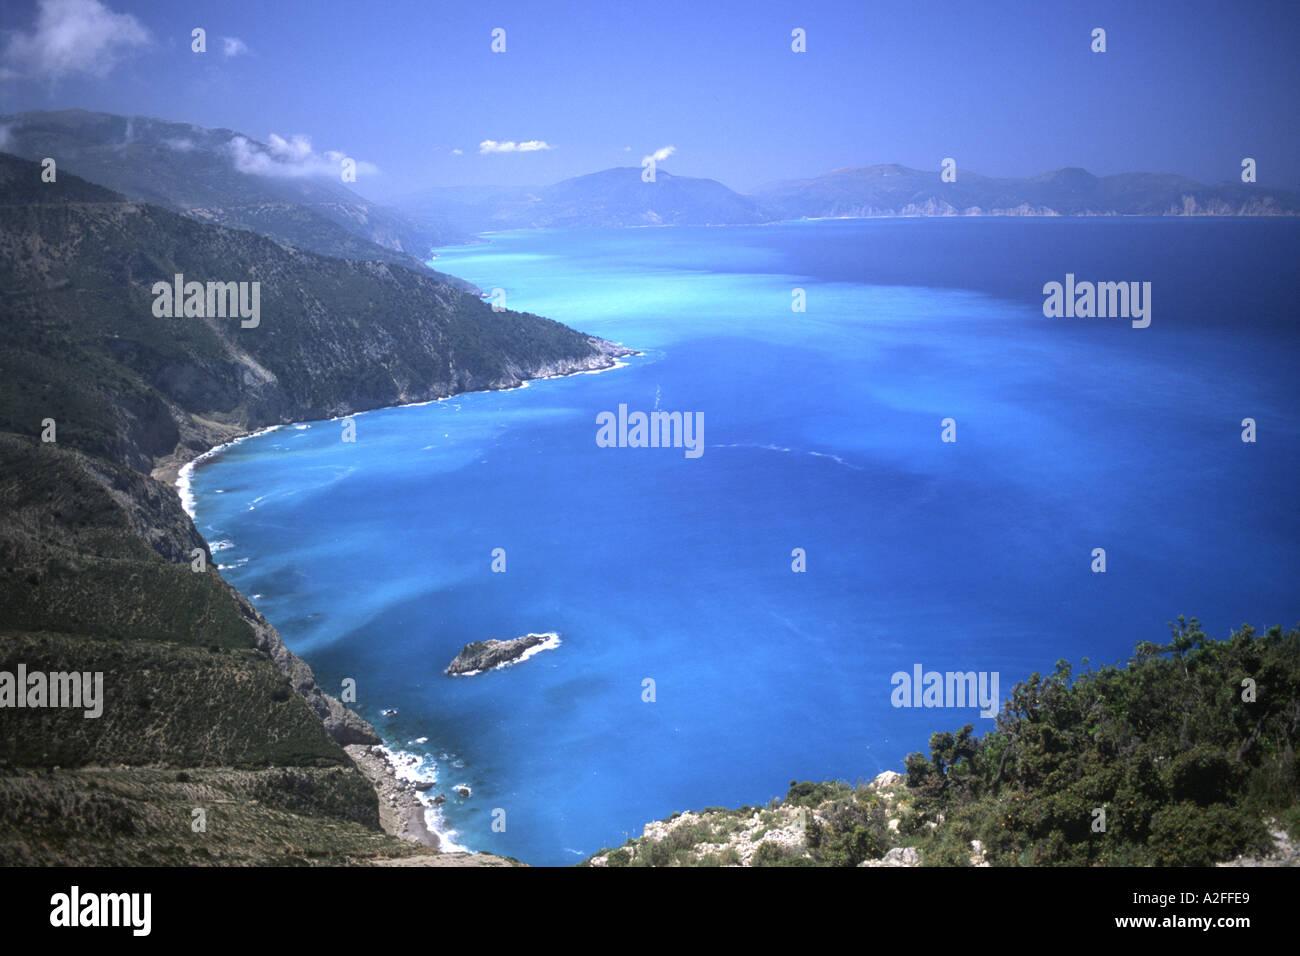 Kefalonia Cephellonia Myrtos Mirtos Beach Greek Ionian Island of Kefalonioa Cephalonia Kefalinia Greece EU European Union Europe - Stock Image